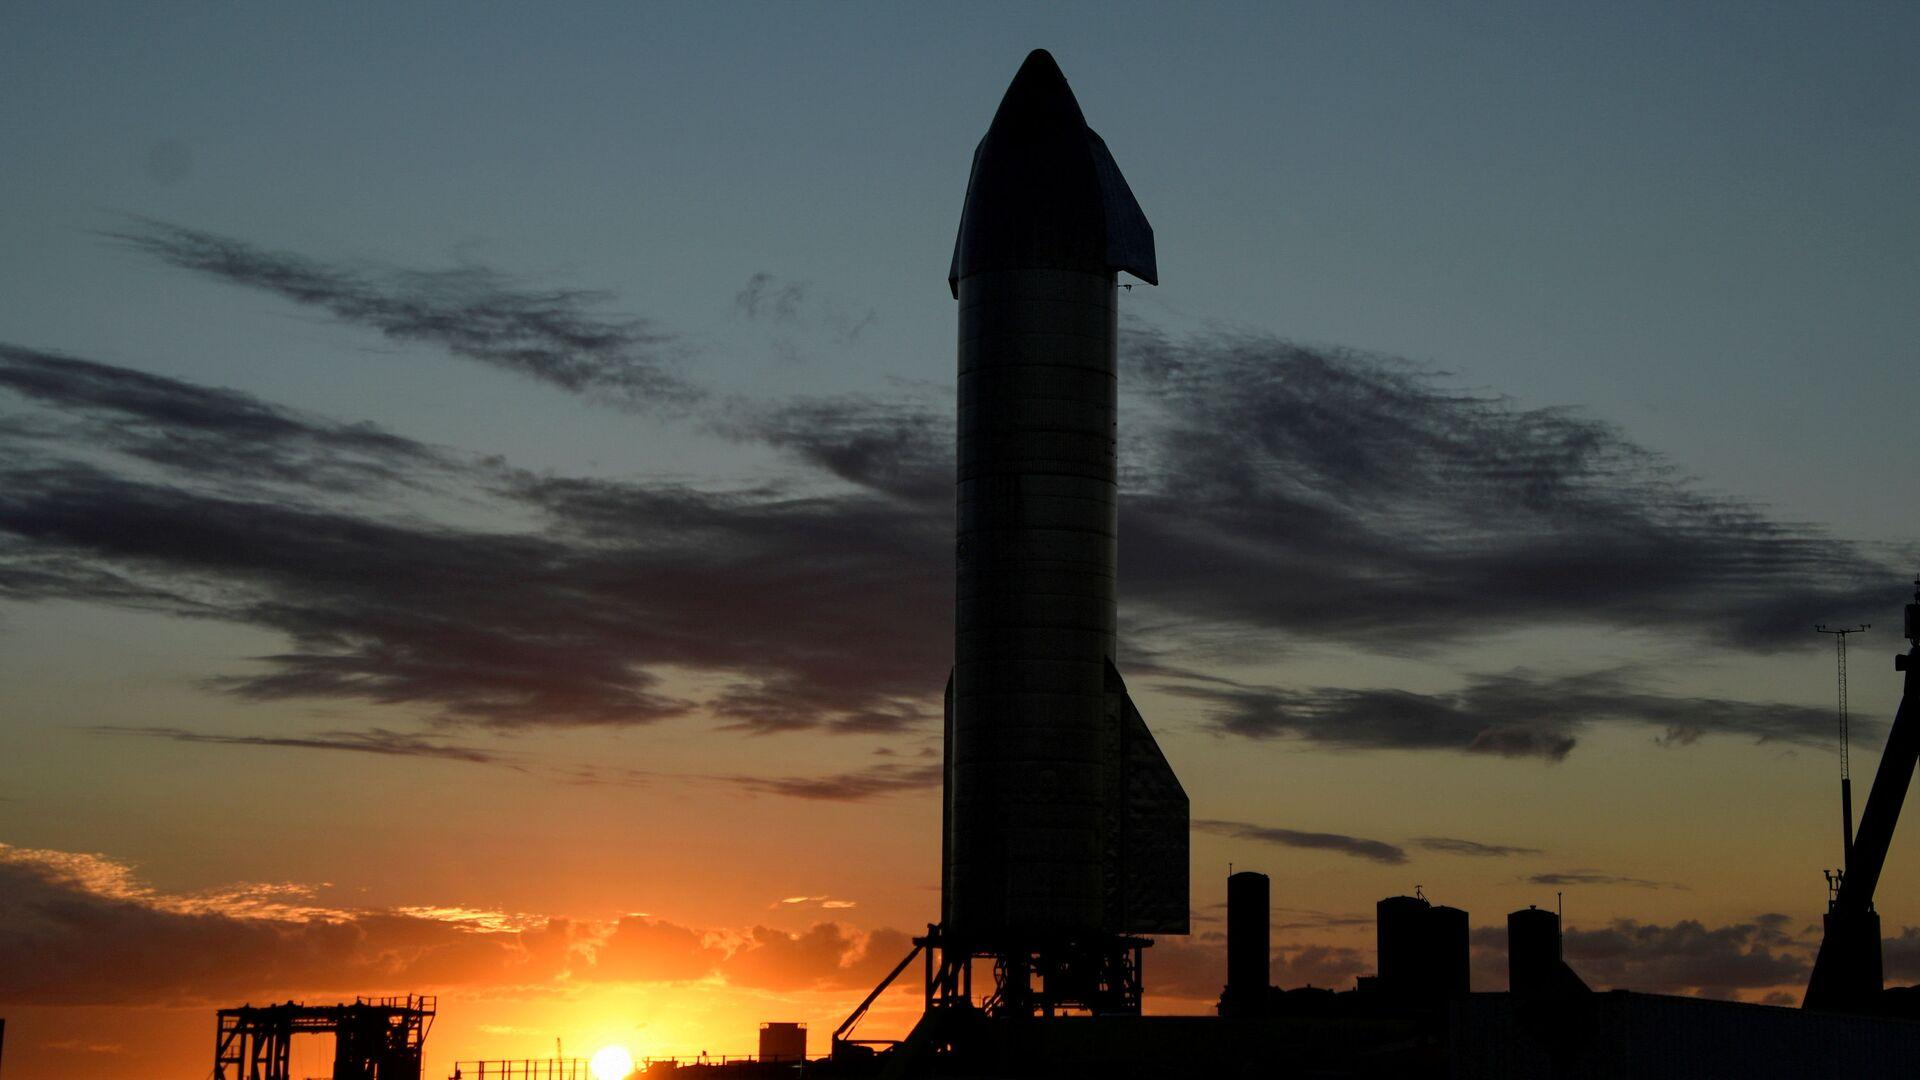 Un cohete Starship de SpaceX - Sputnik Mundo, 1920, 12.02.2021